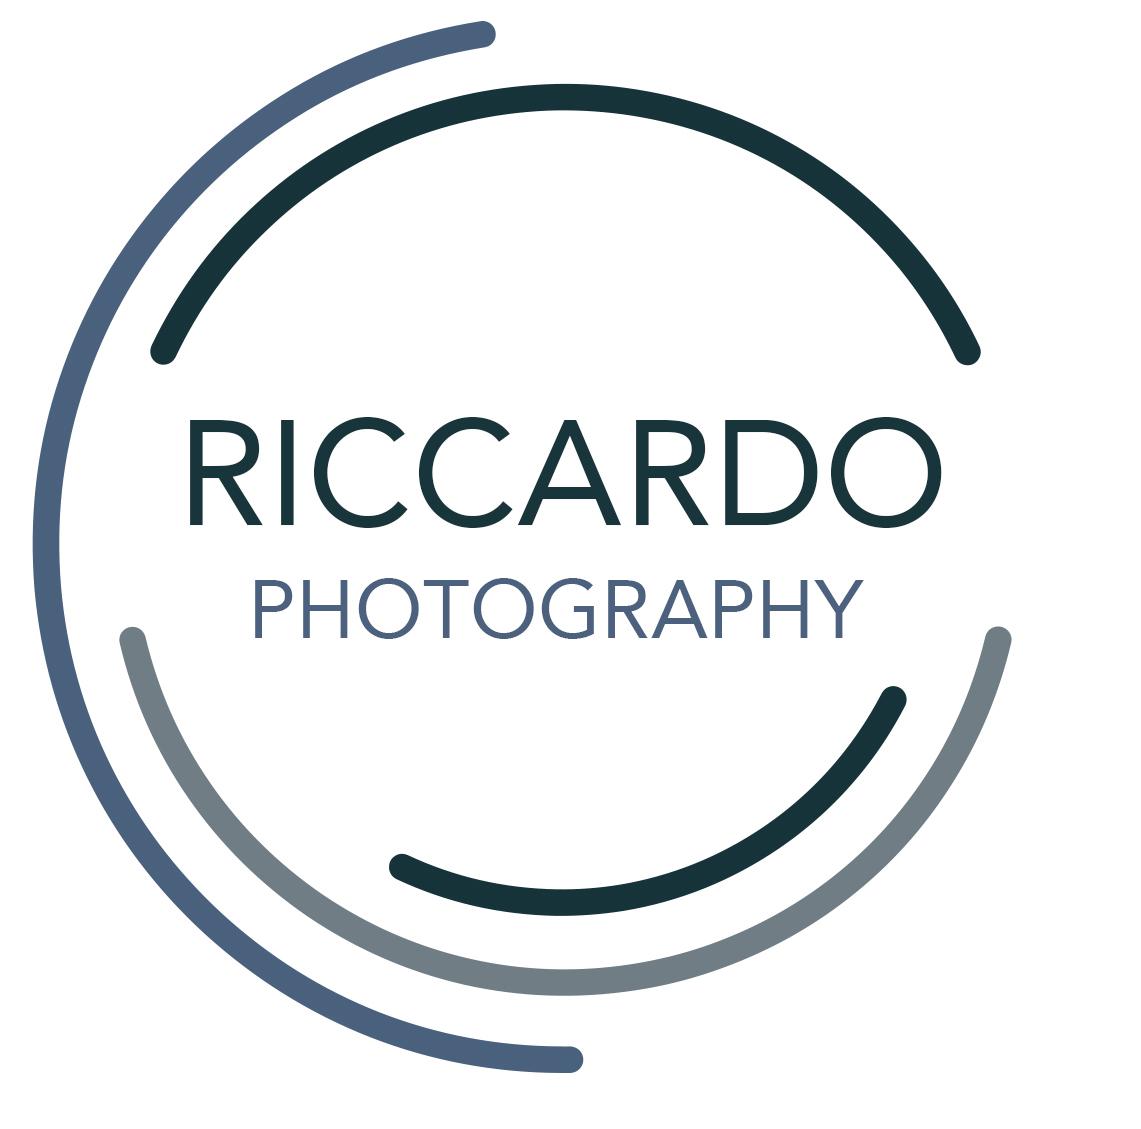 Riccardo Photography